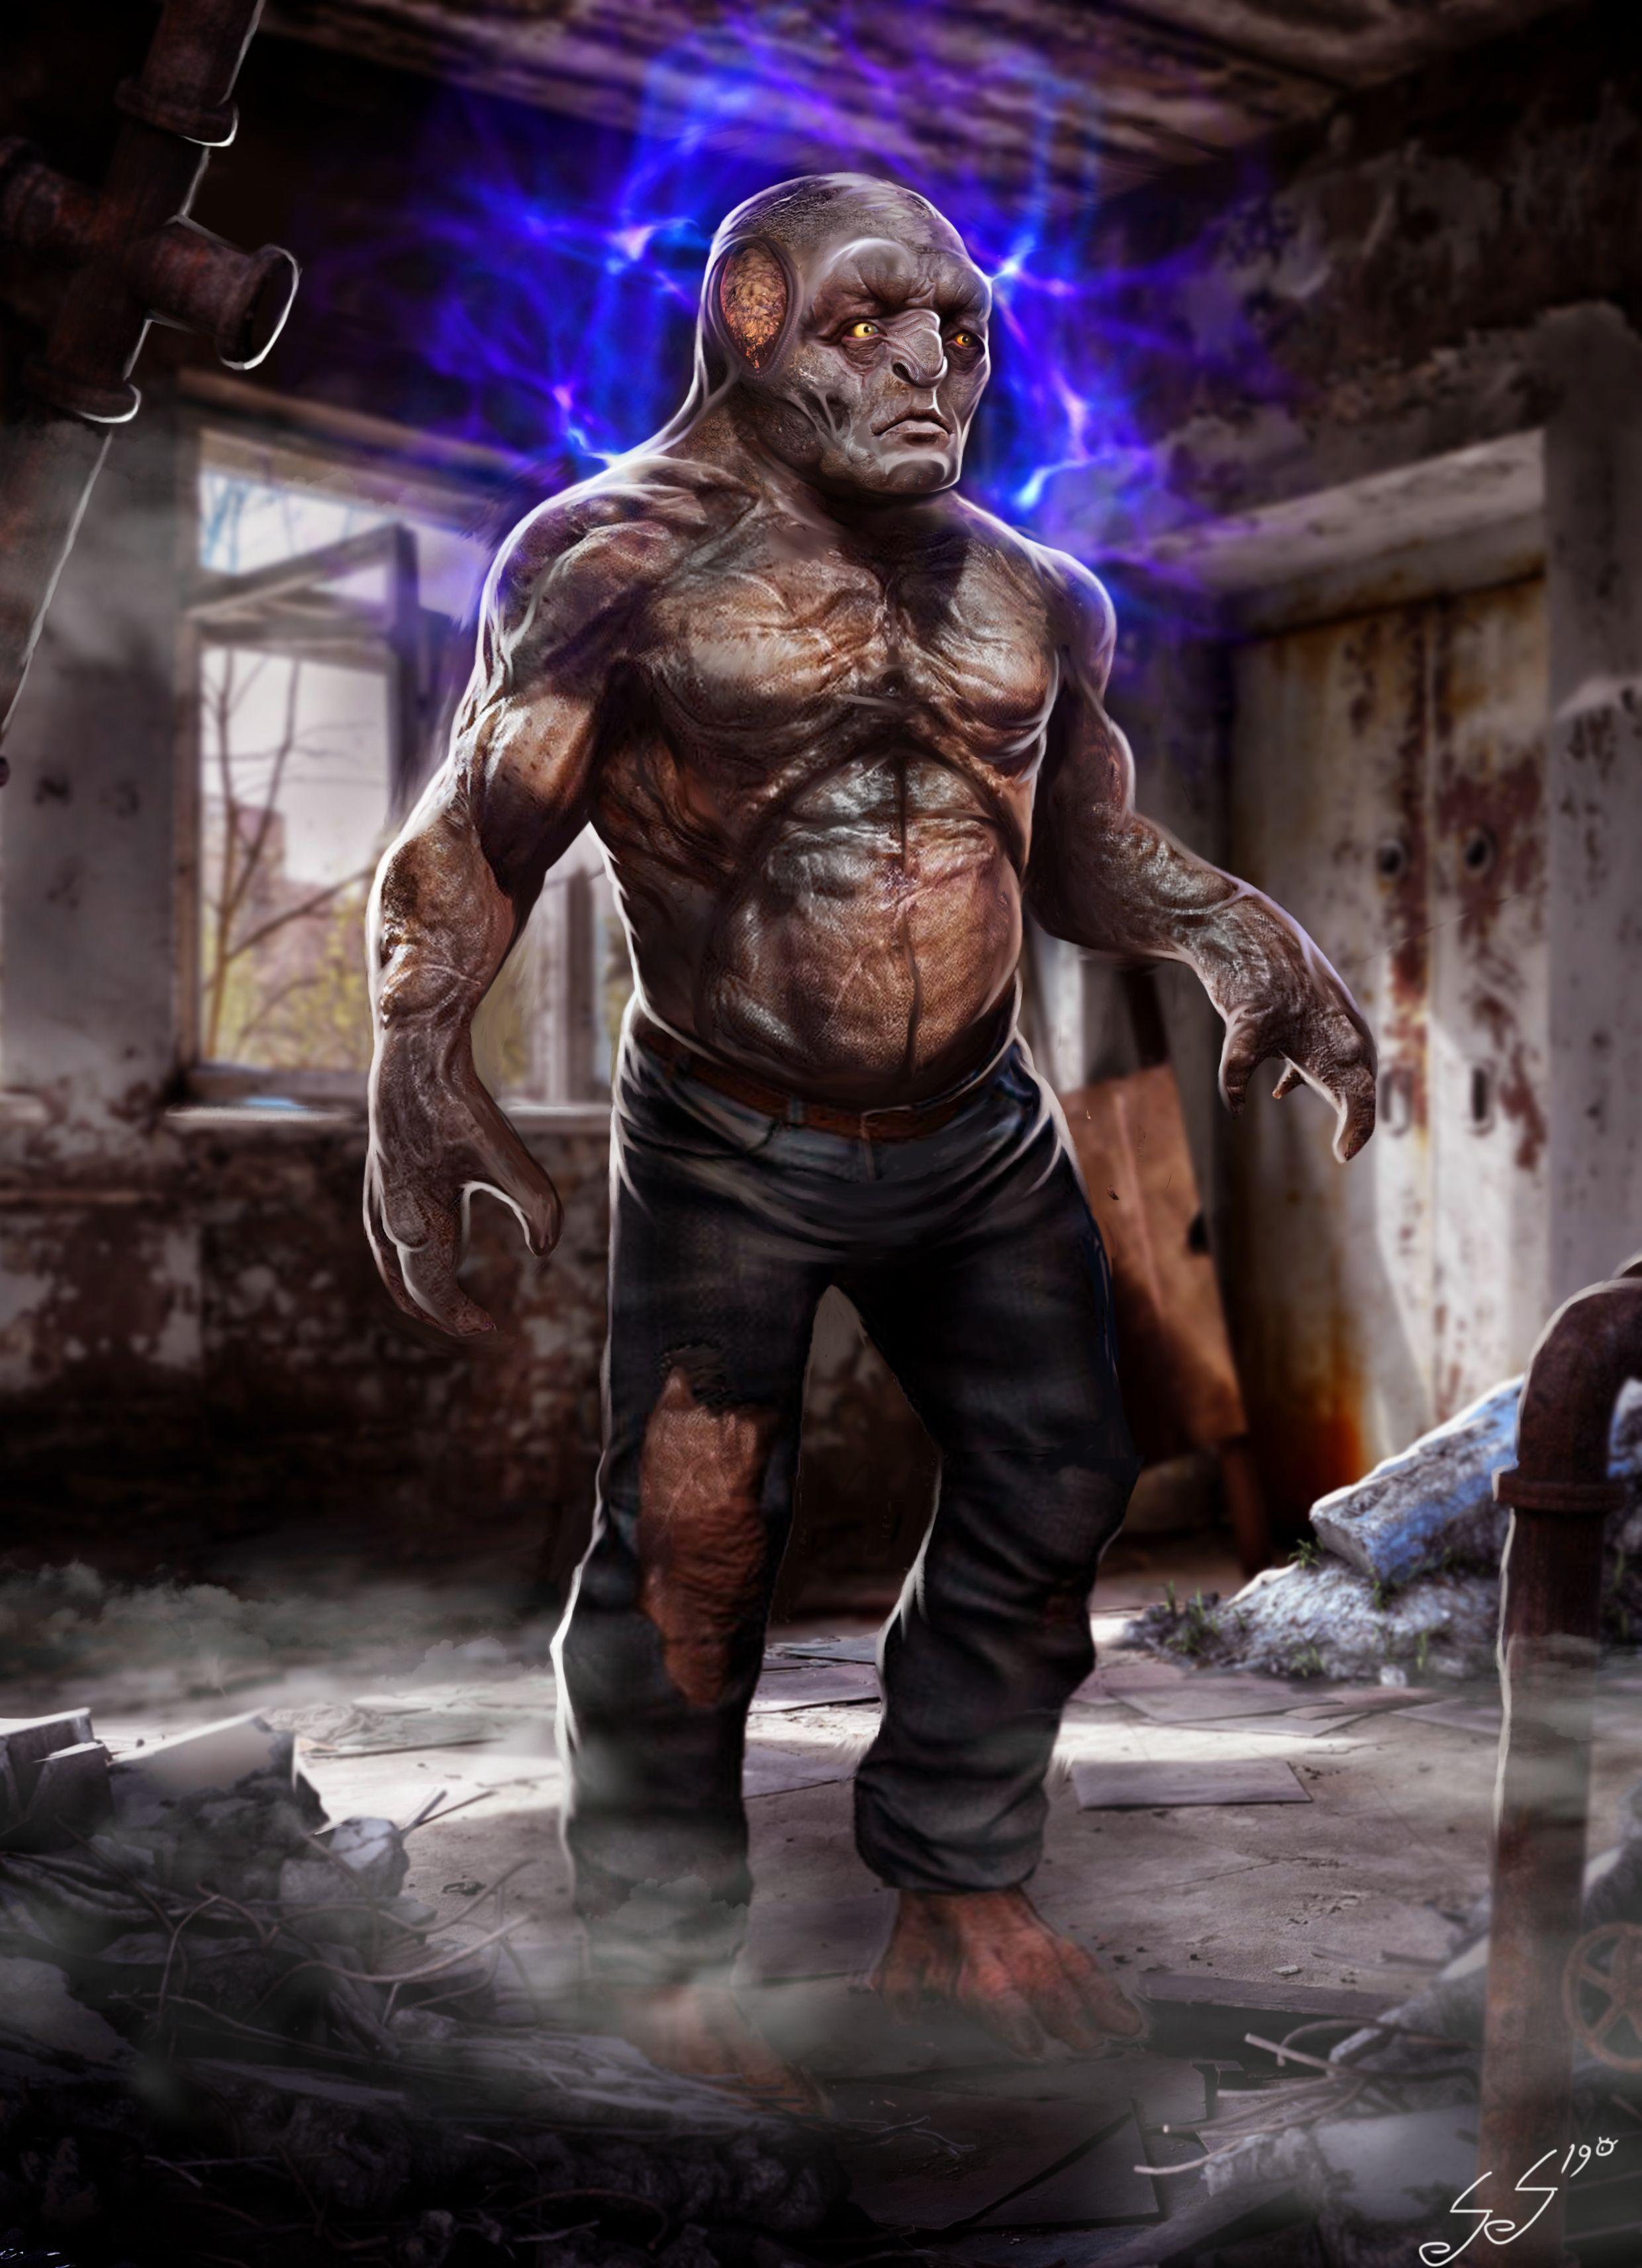 Крутые картинки с мутантами